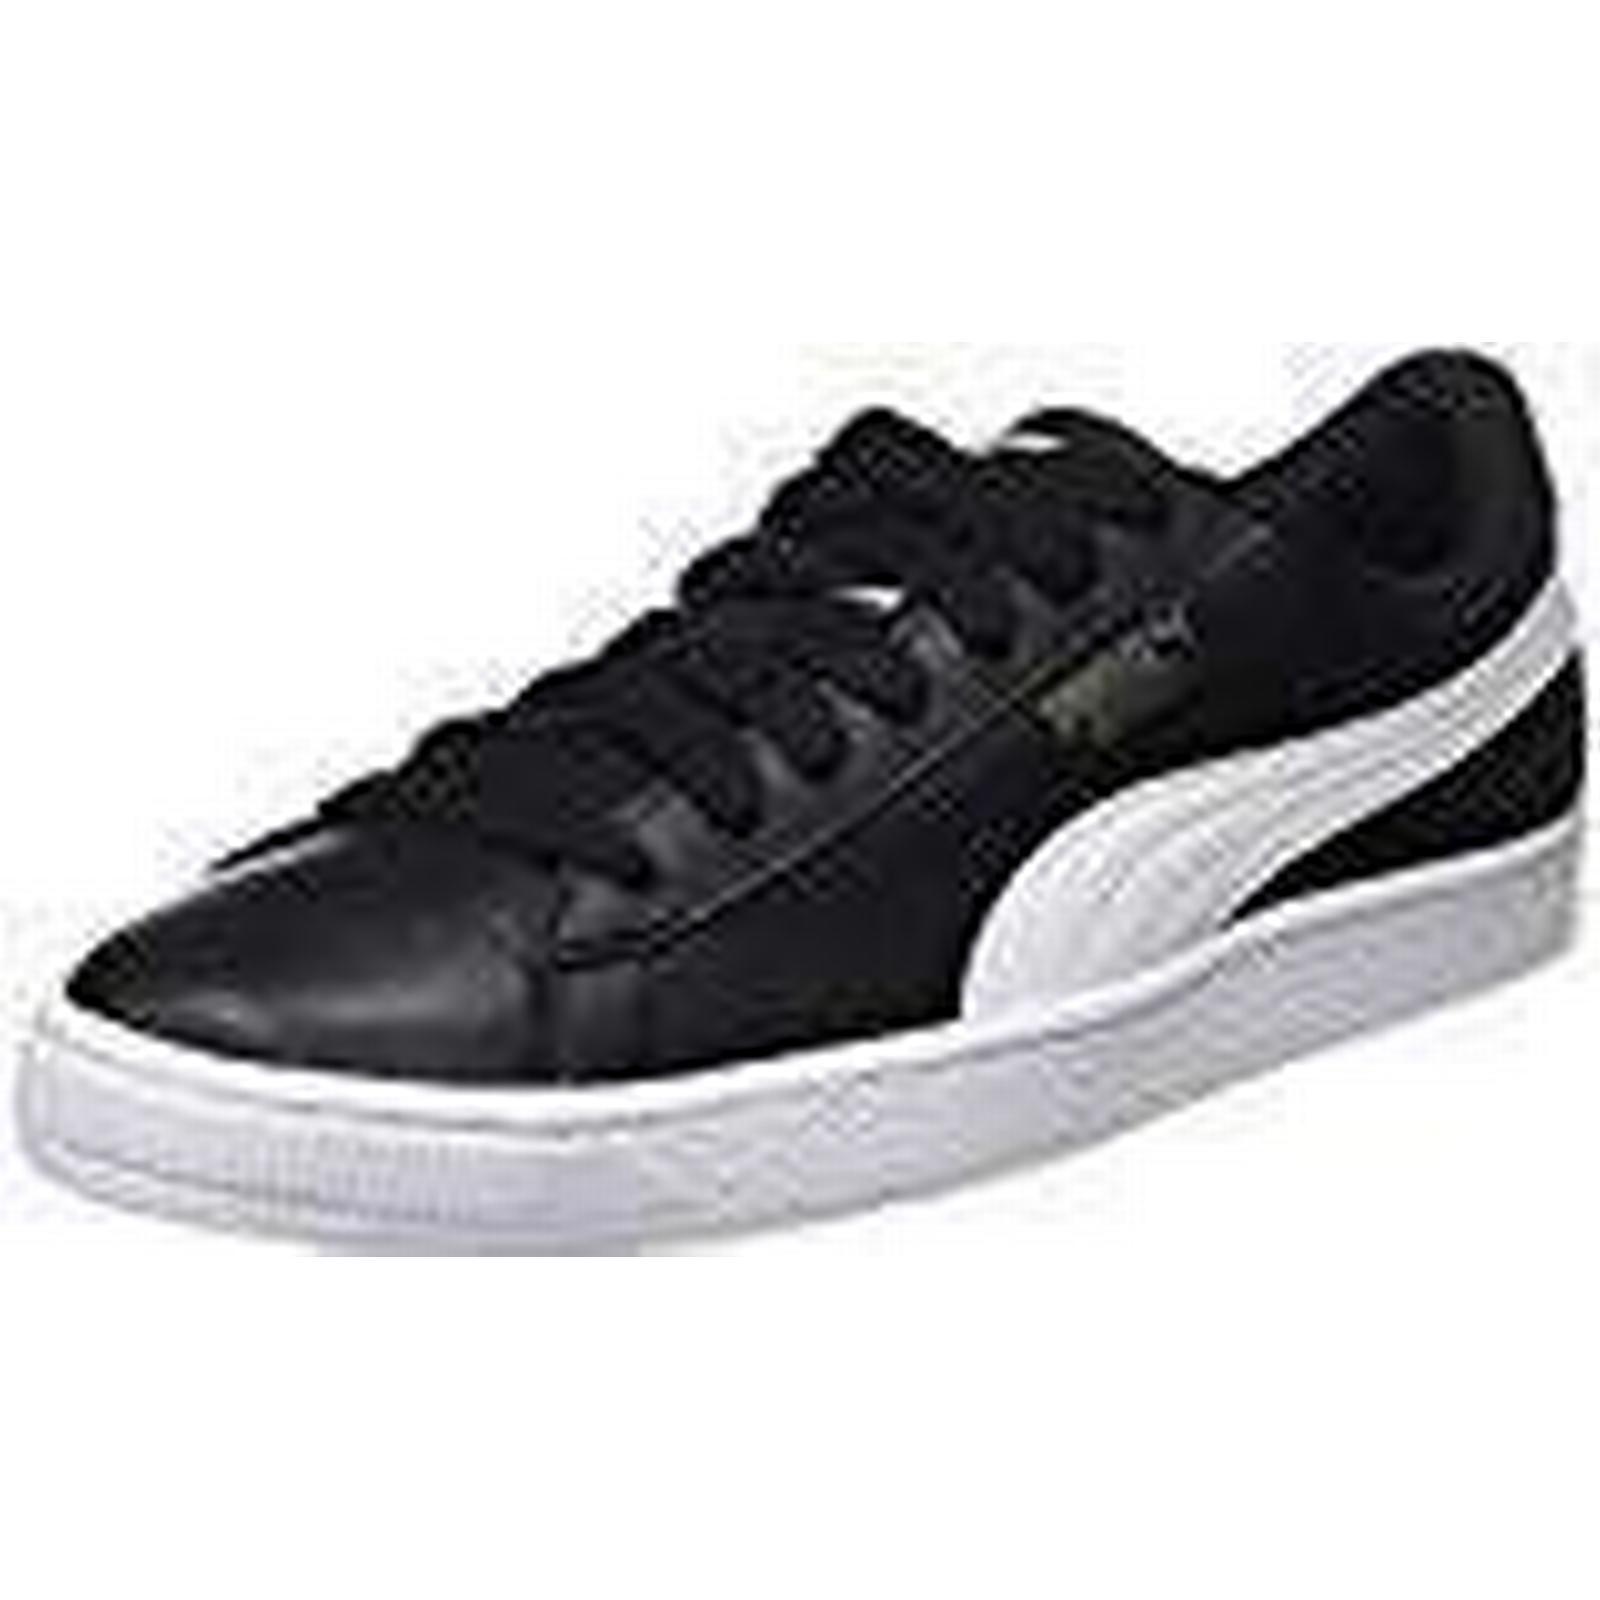 Puma Unisex Adults' black-white, Basket Classic Lfs Low-Top Sneakers, black-white, Adults' 3.5 UK 1f6fc3